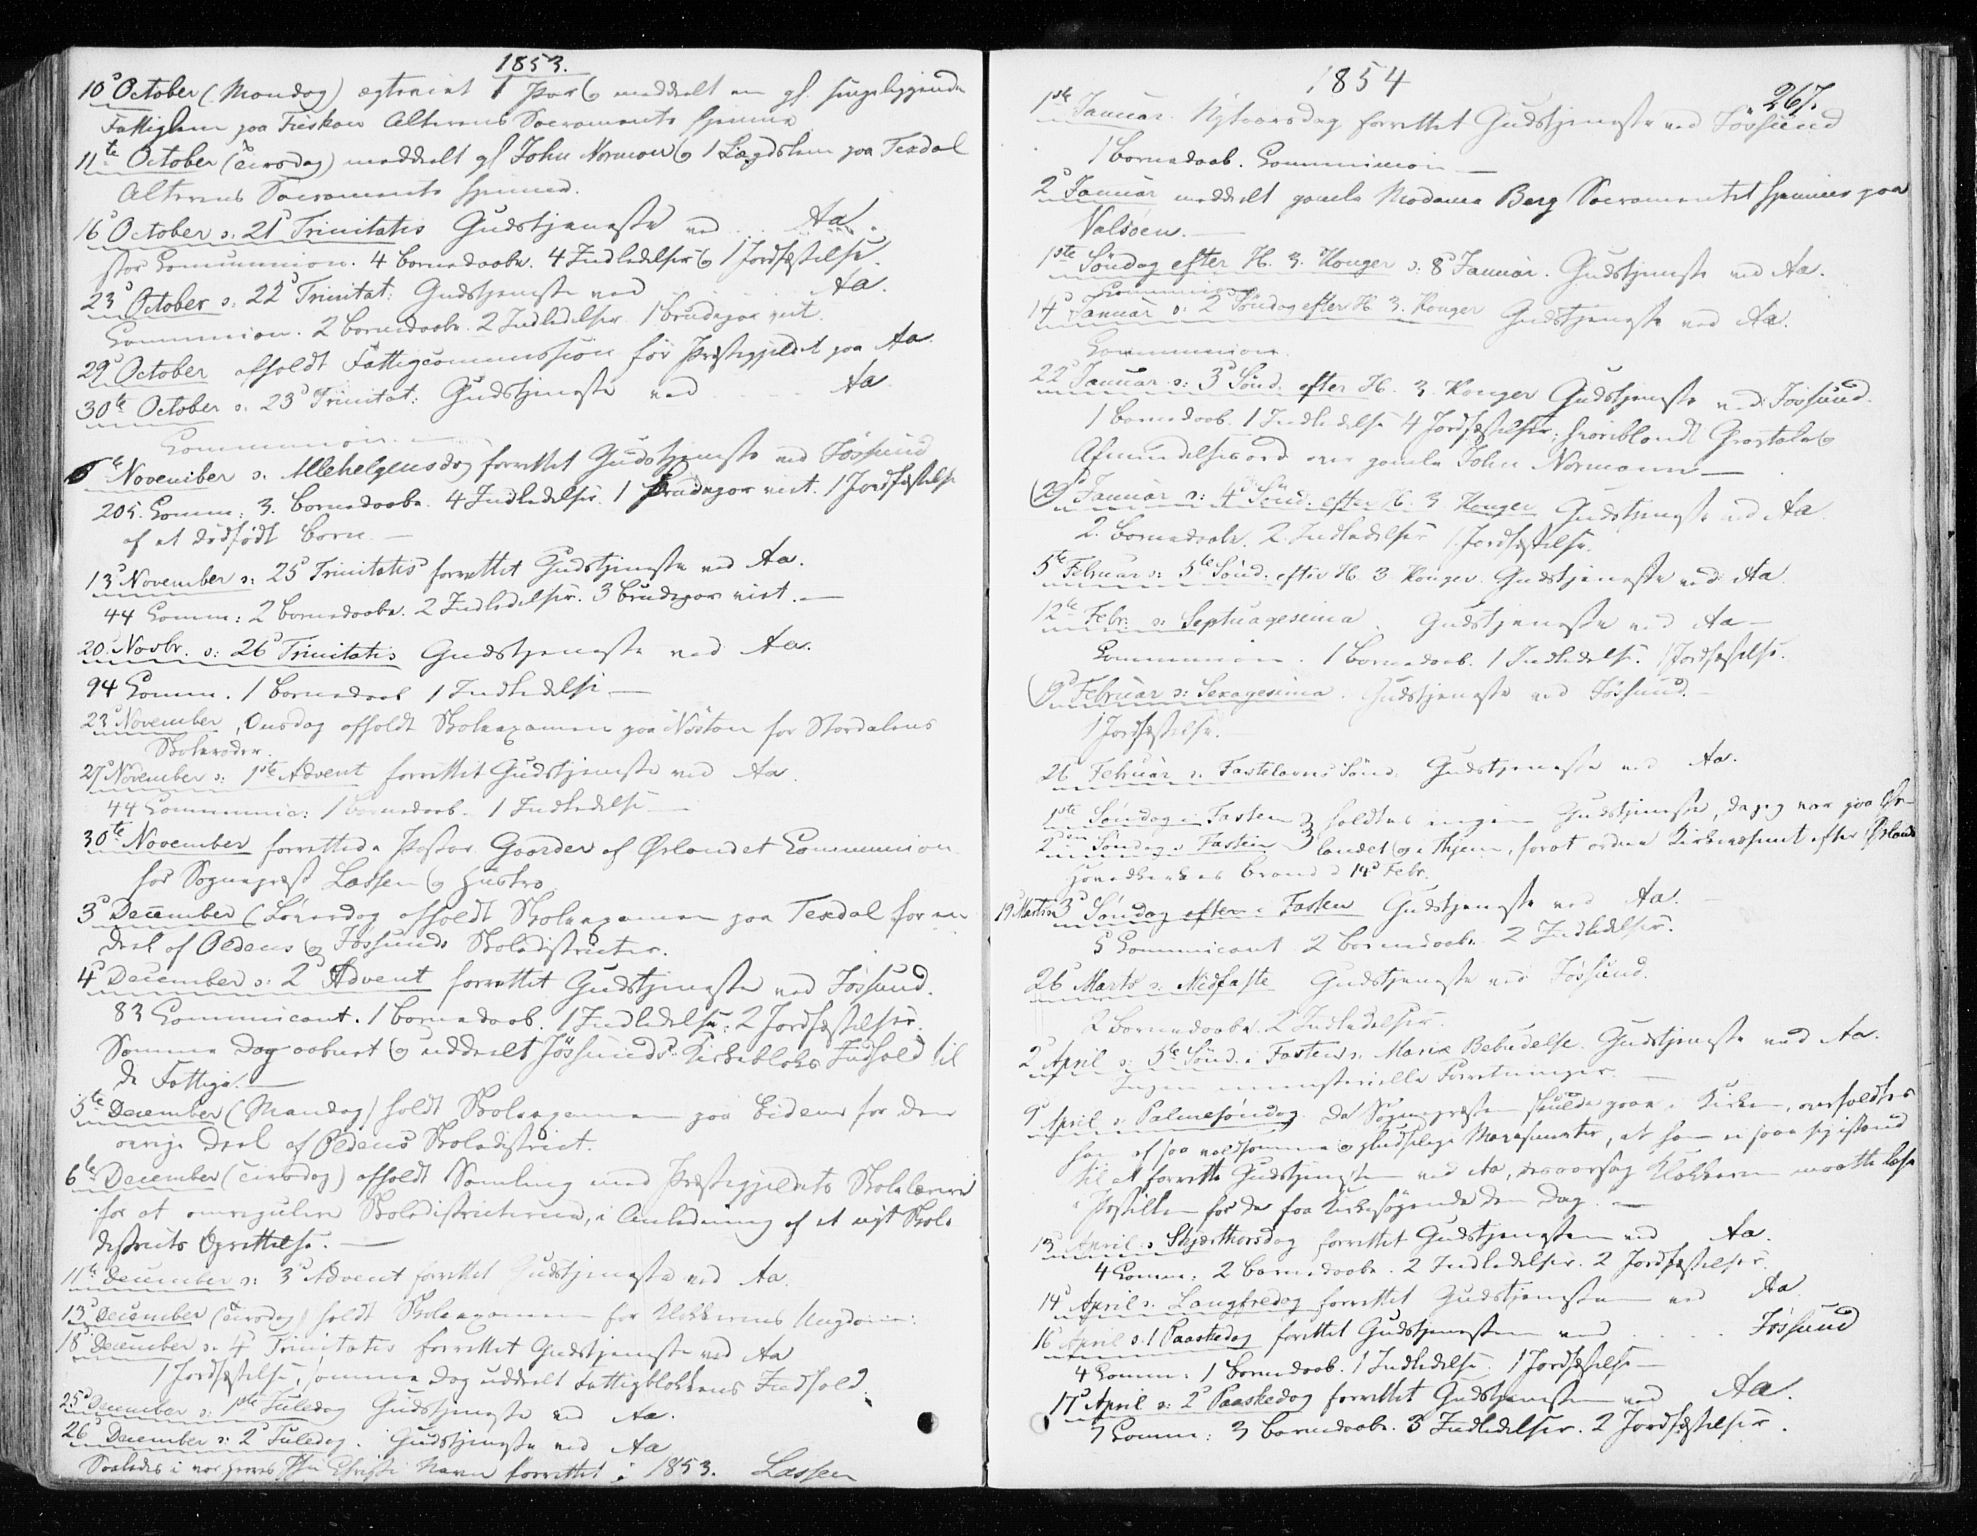 SAT, Ministerialprotokoller, klokkerbøker og fødselsregistre - Sør-Trøndelag, 655/L0677: Parish register (official) no. 655A06, 1847-1860, p. 267